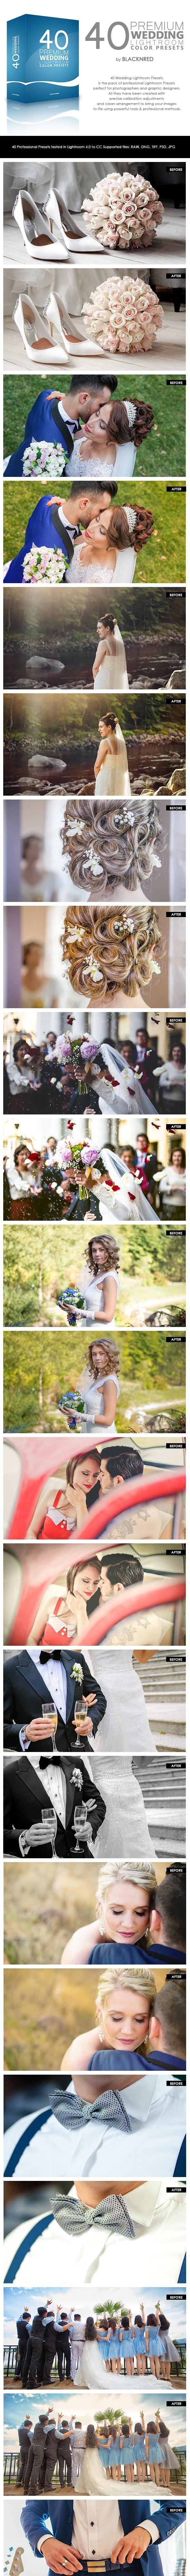 40 Premium Wedding Lightroom Preset Pack - Lightroom Presets Add-ons